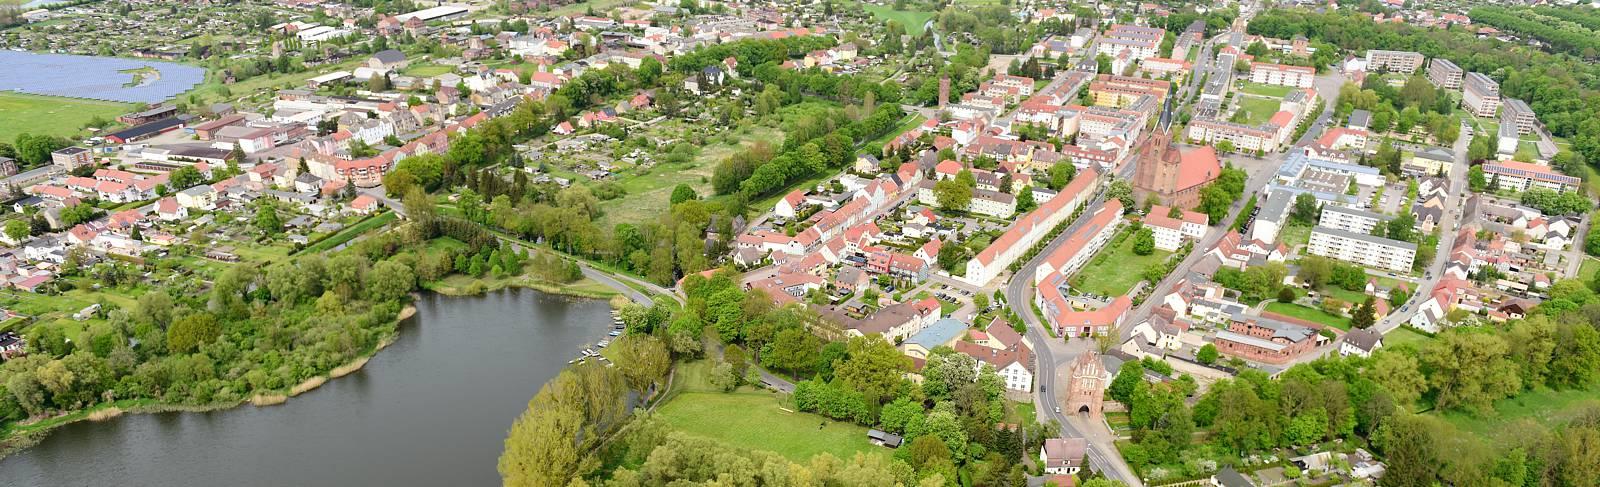 interaktive Städtetour Friedland